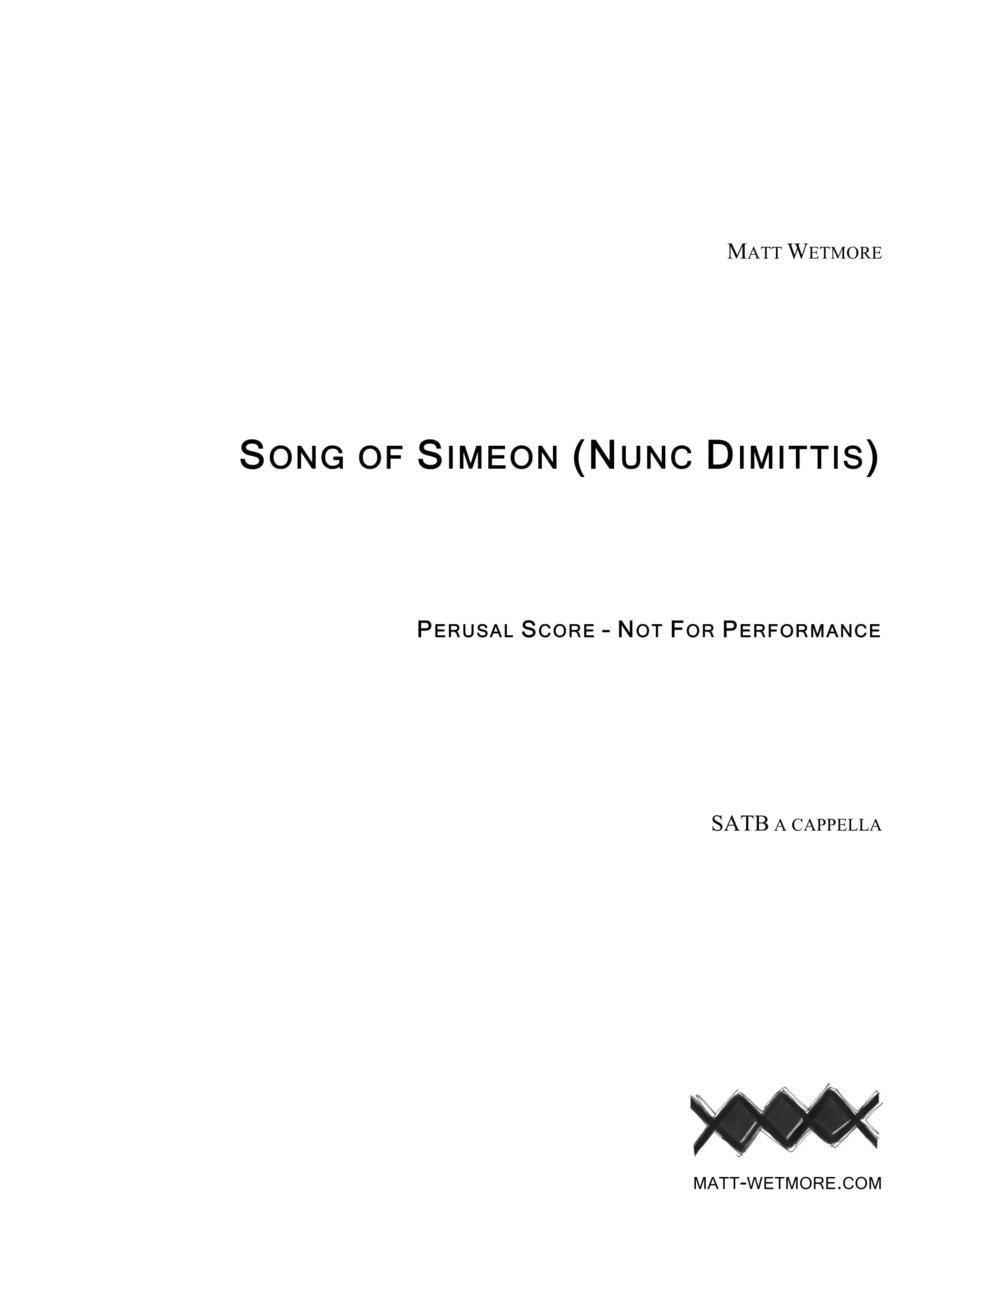 Song of Simeon - Perusal-1.jpg